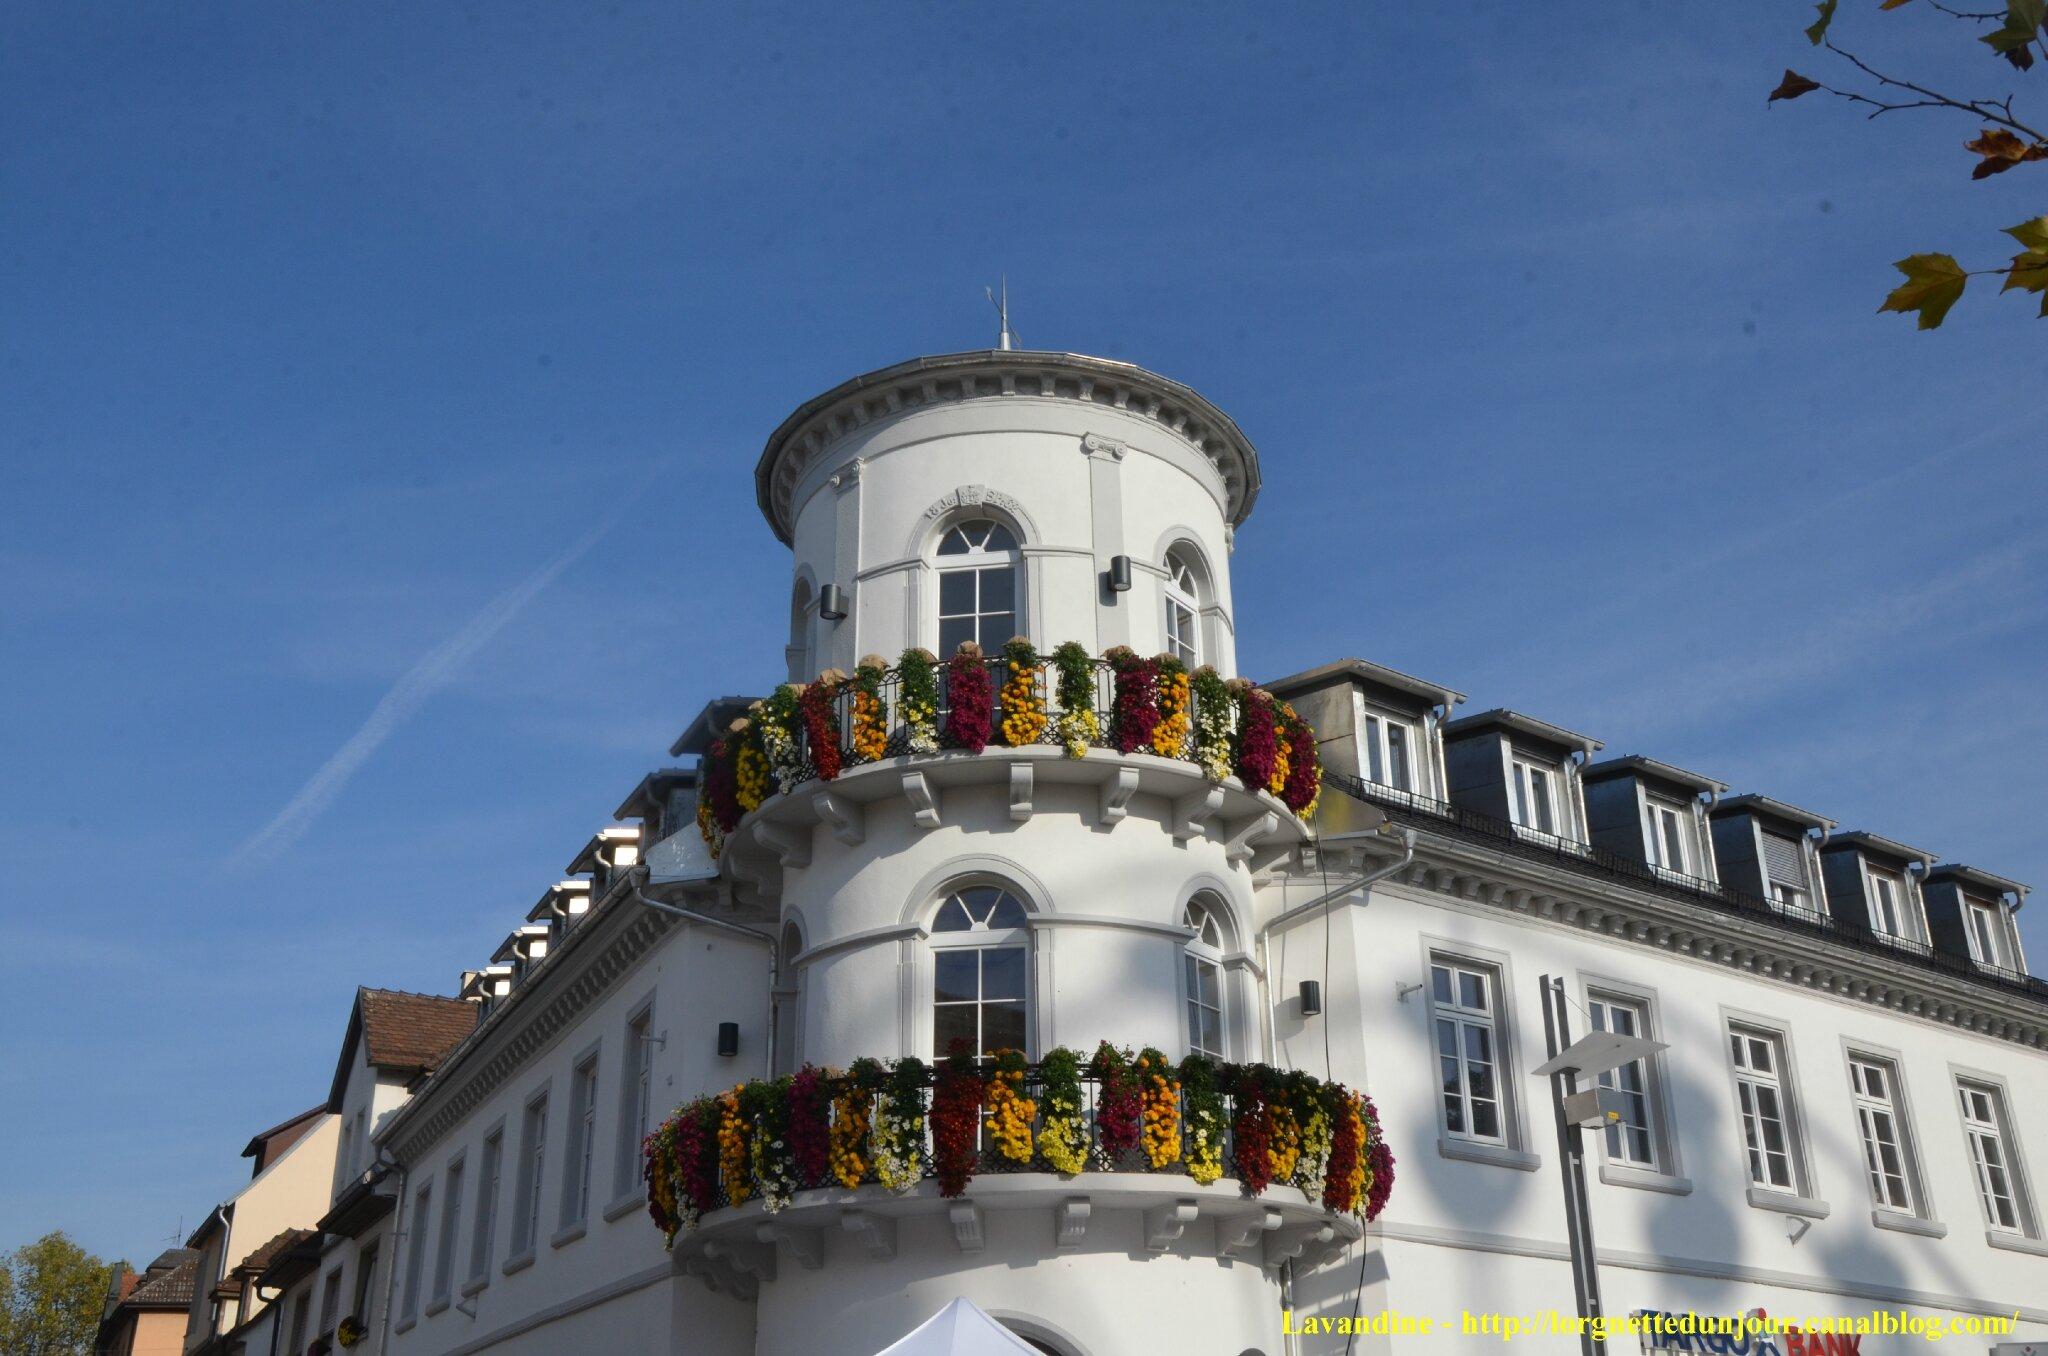 10/11/14 : Chrysanthema fin